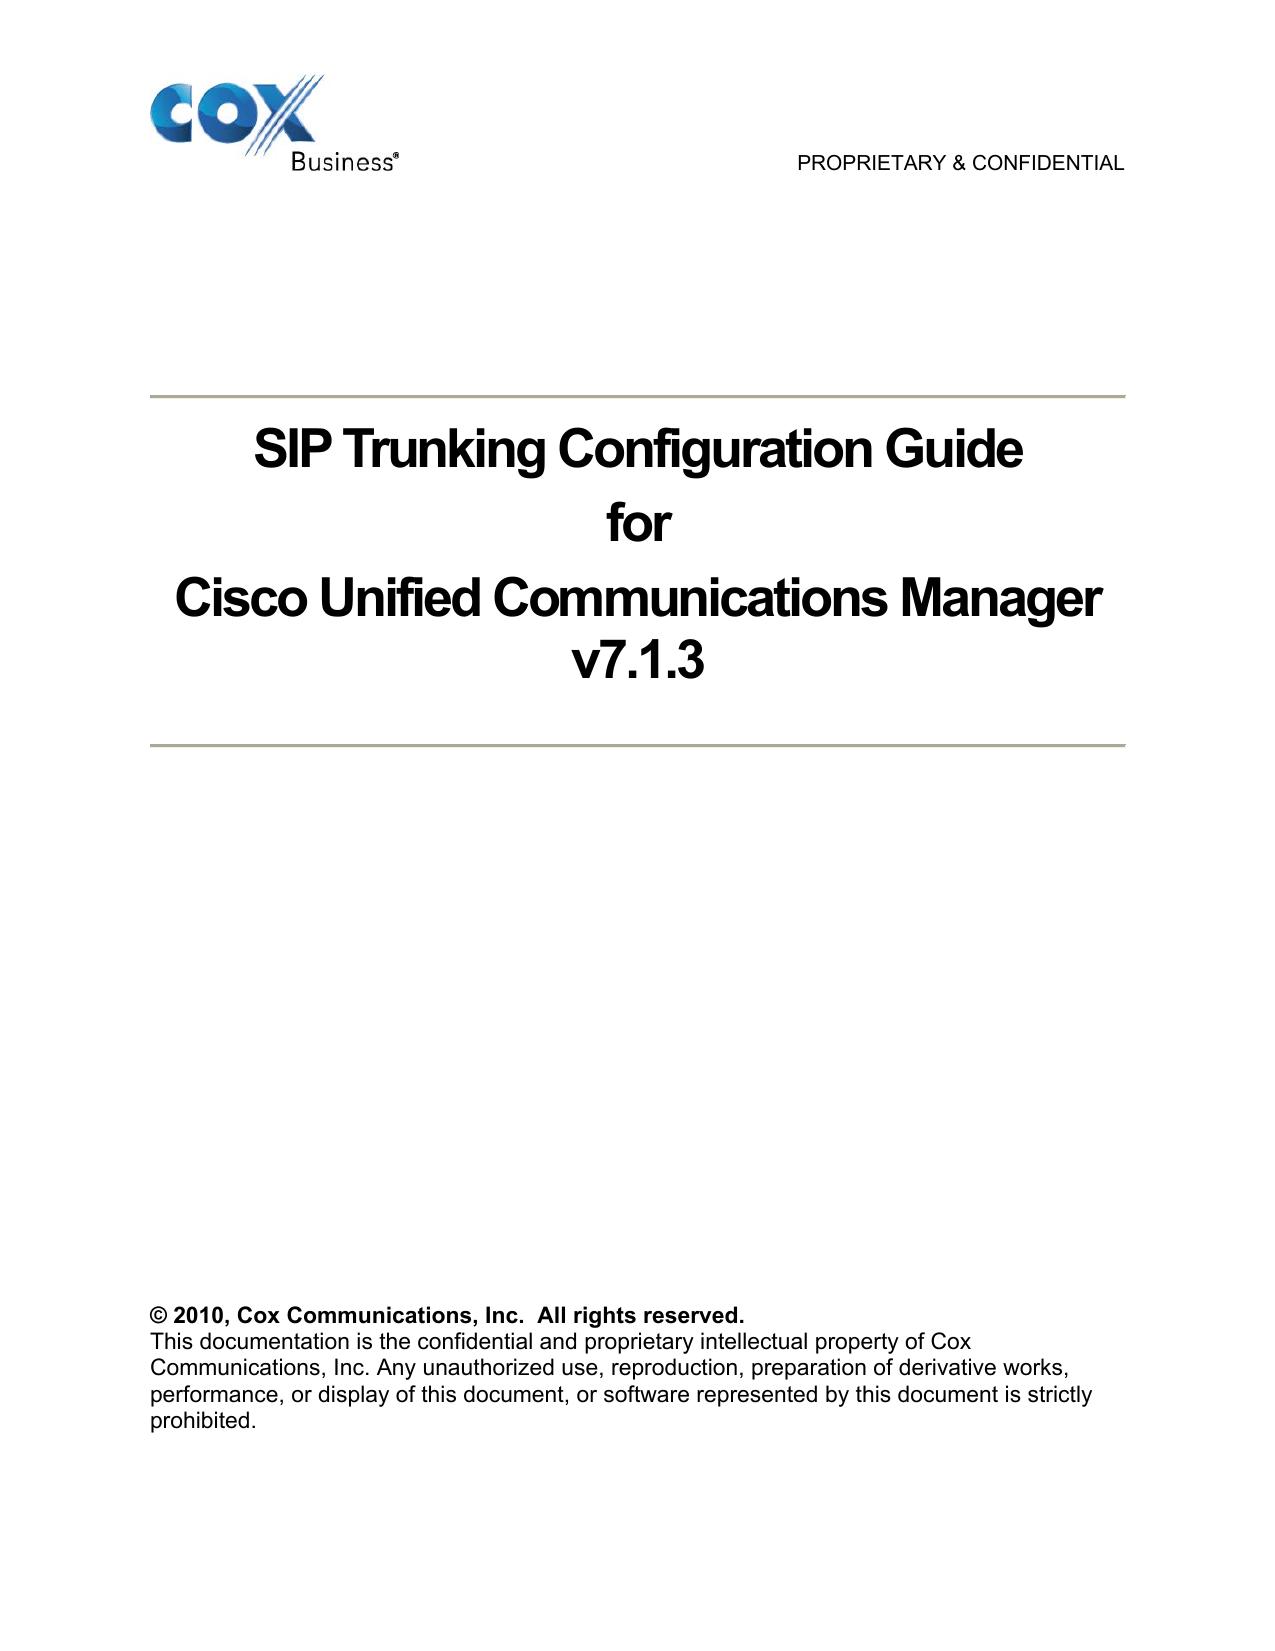 CUCM SIP Trunking Configuration | manualzz com